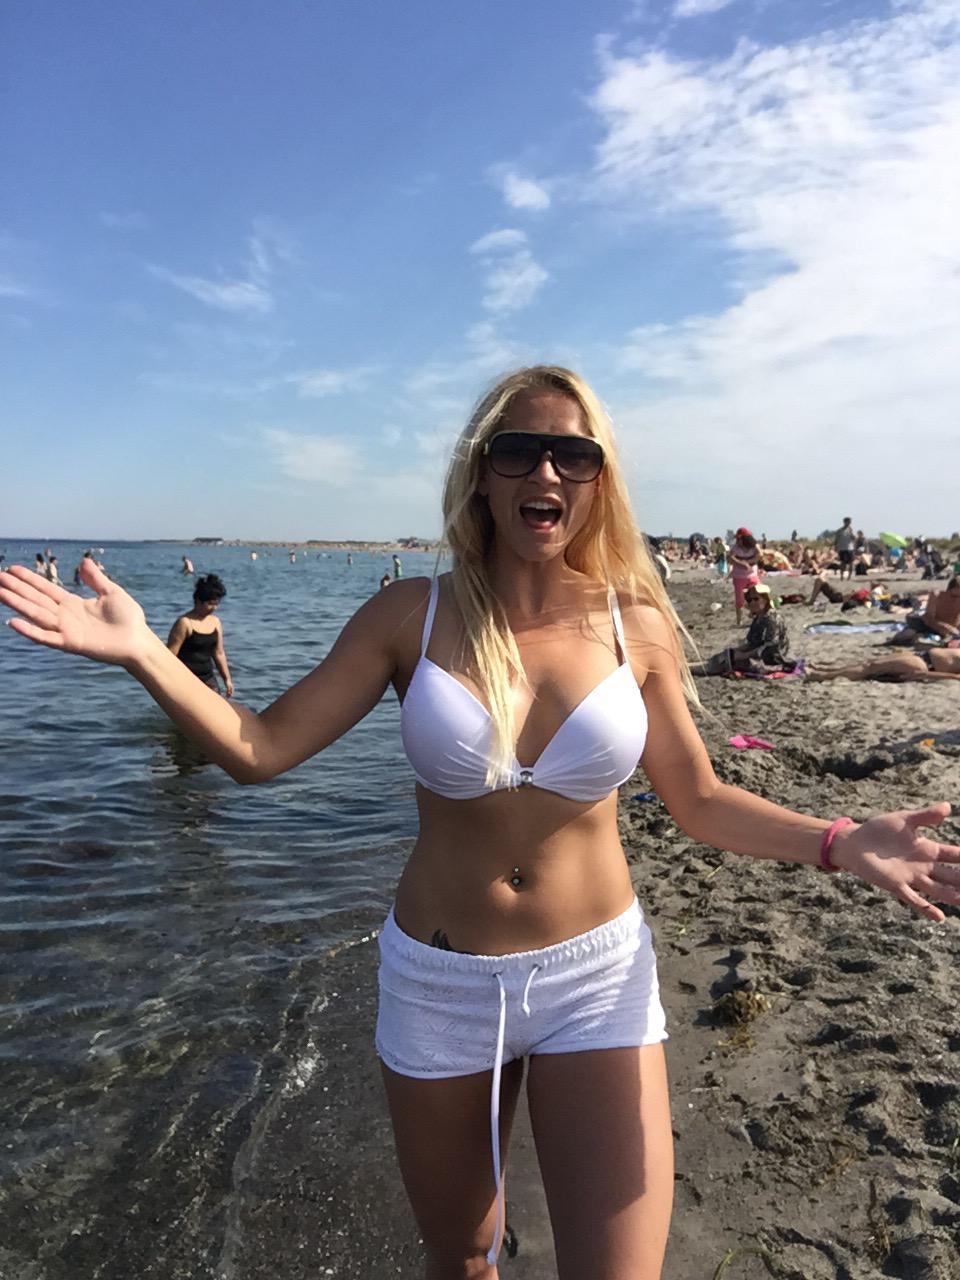 normale bryster danmarks bedste bryster